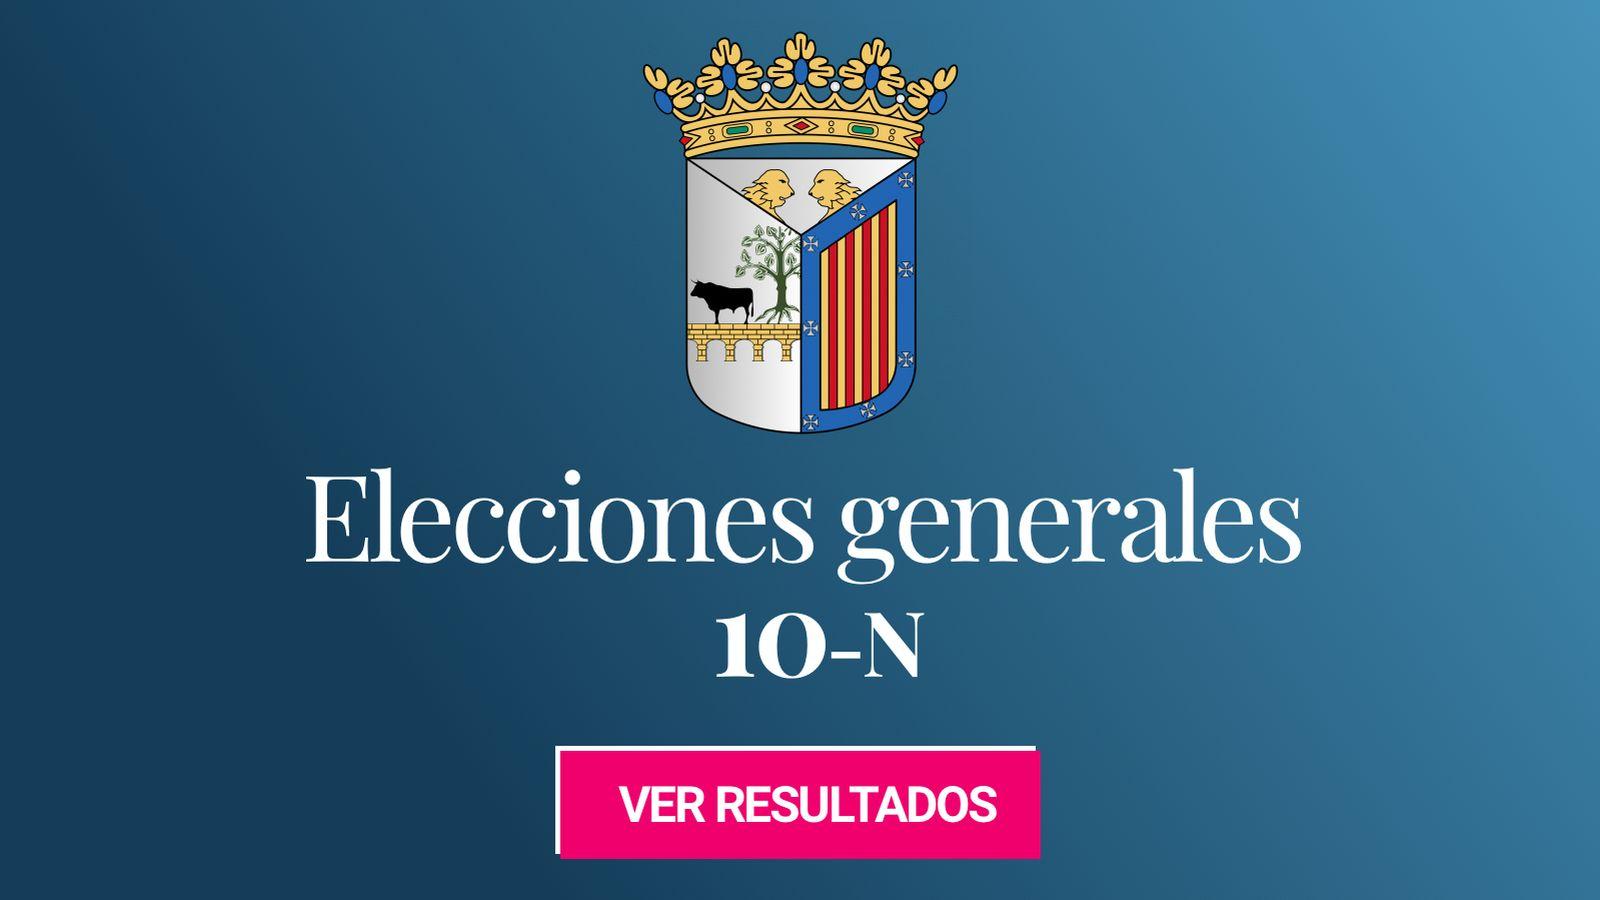 Foto: Elecciones generales 2019 en Salamanca. (C.C./EC)